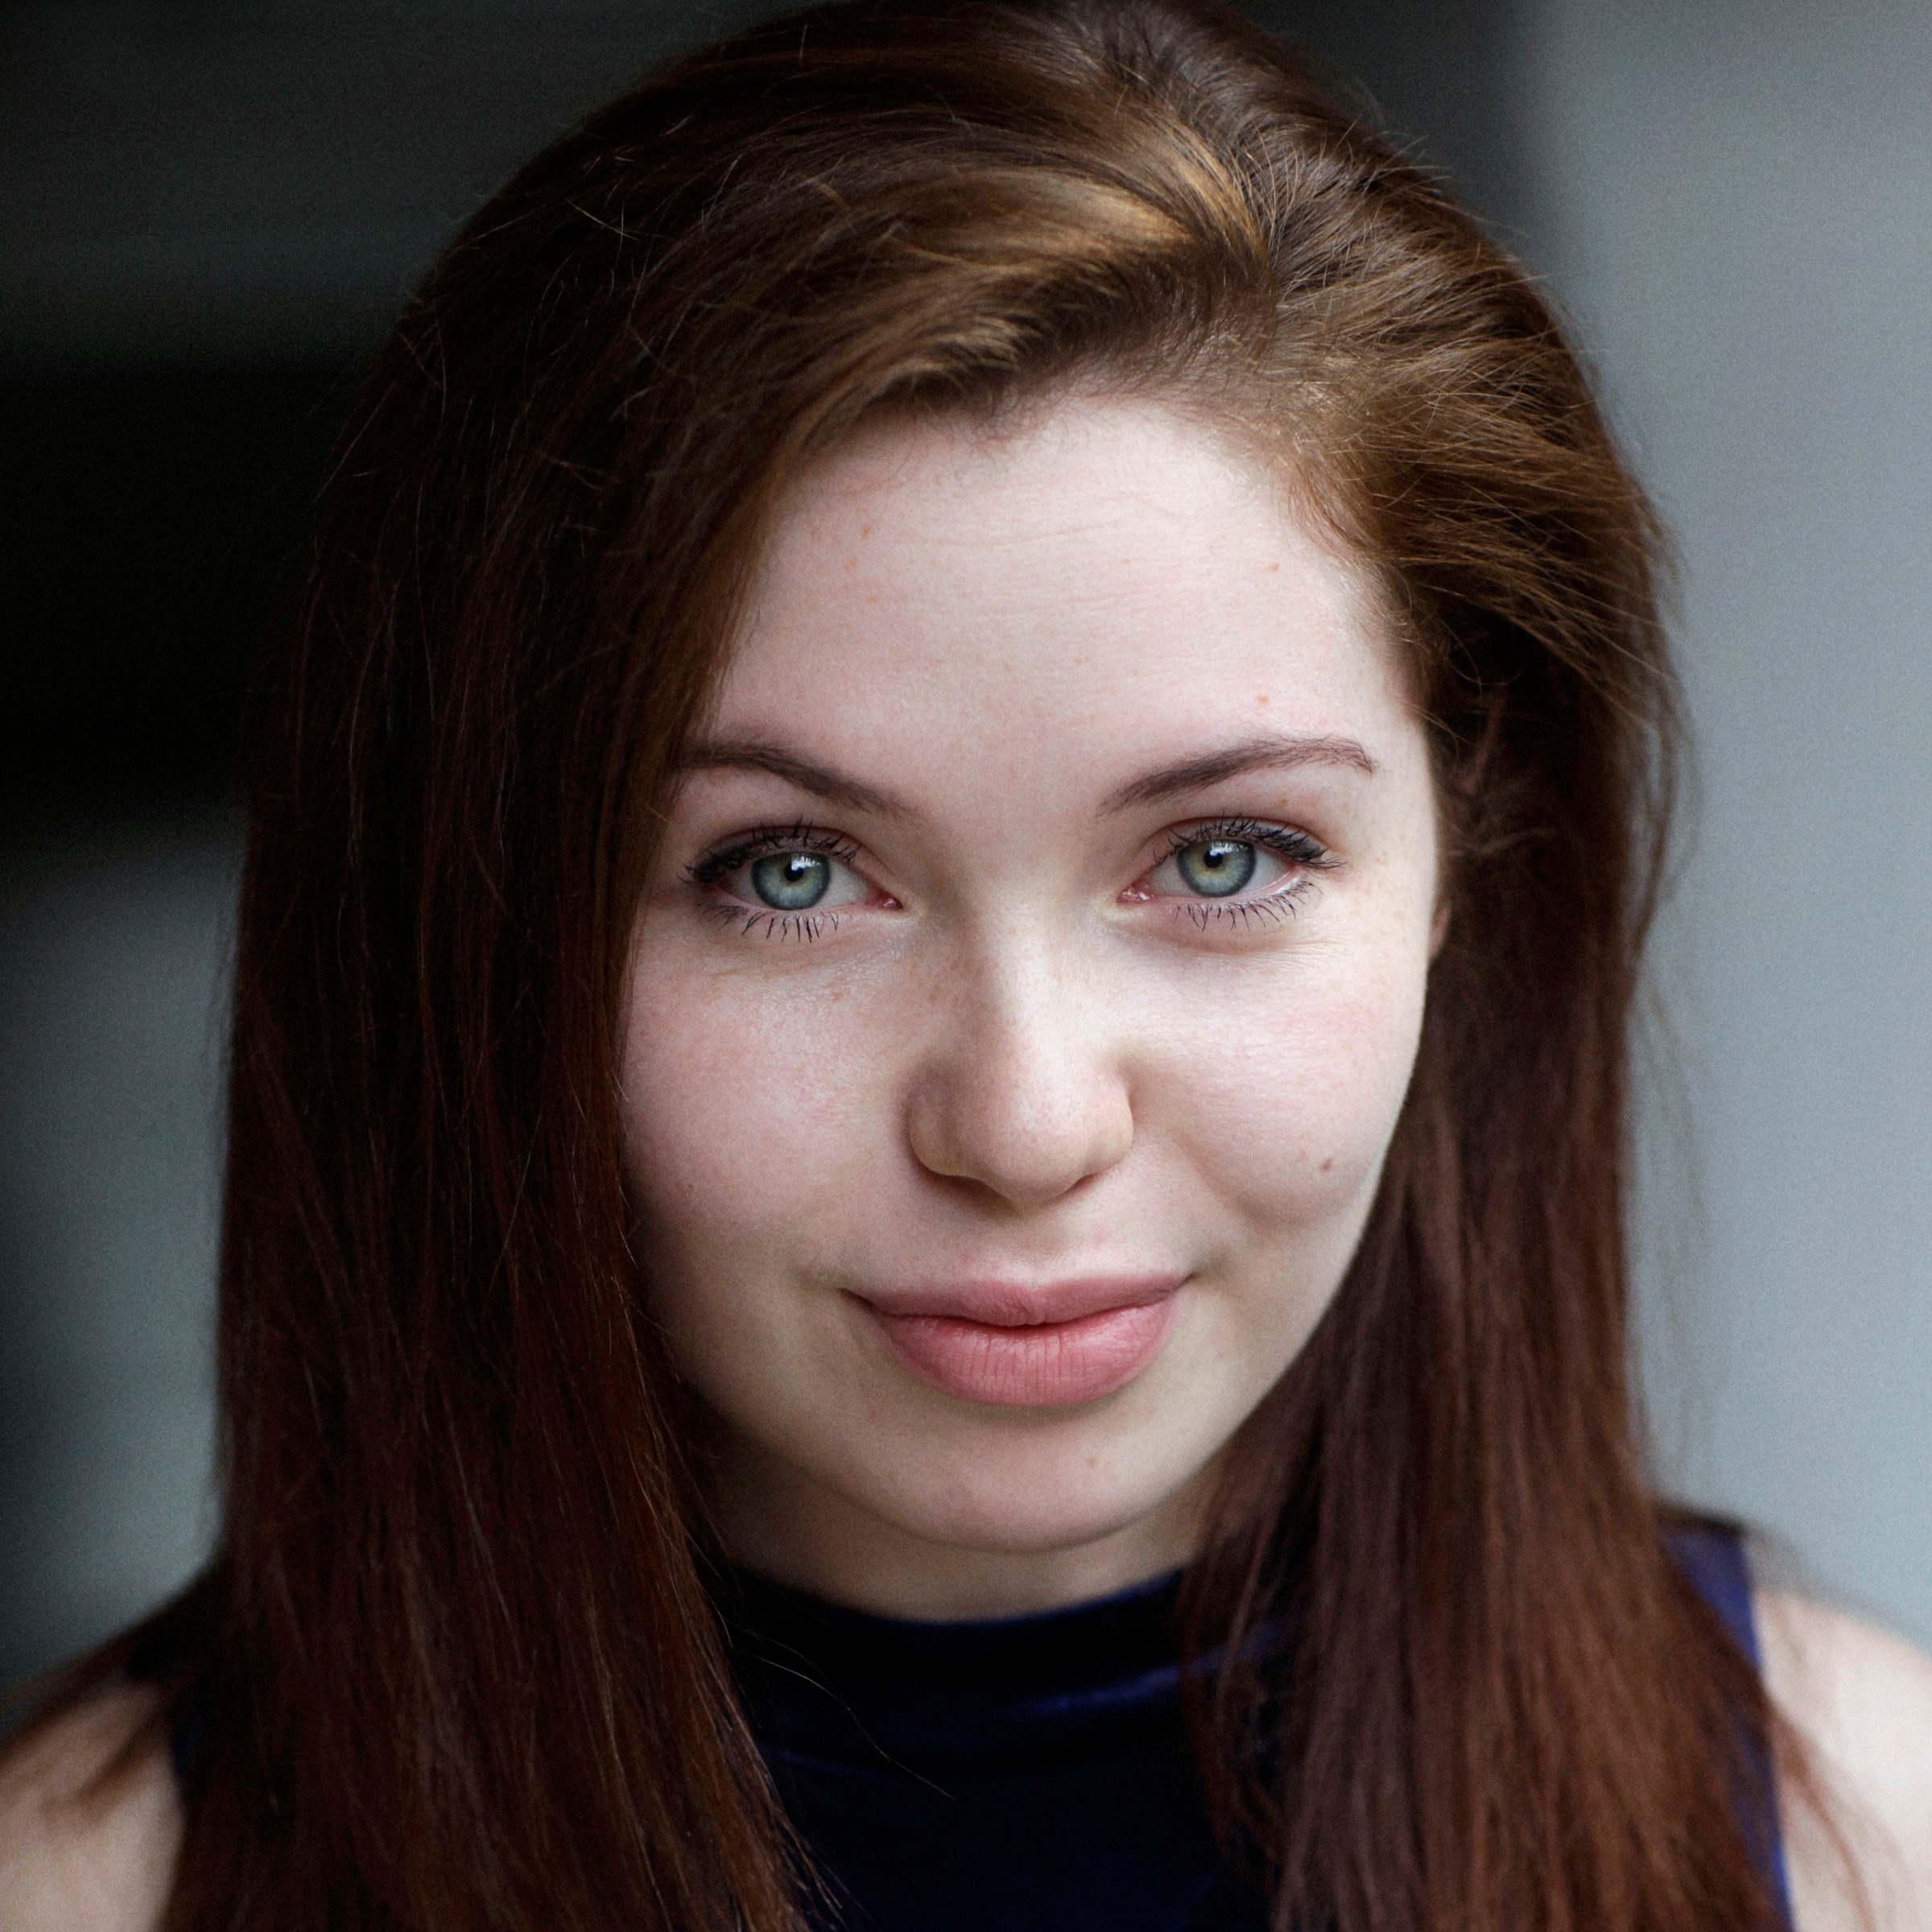 Emily Costello